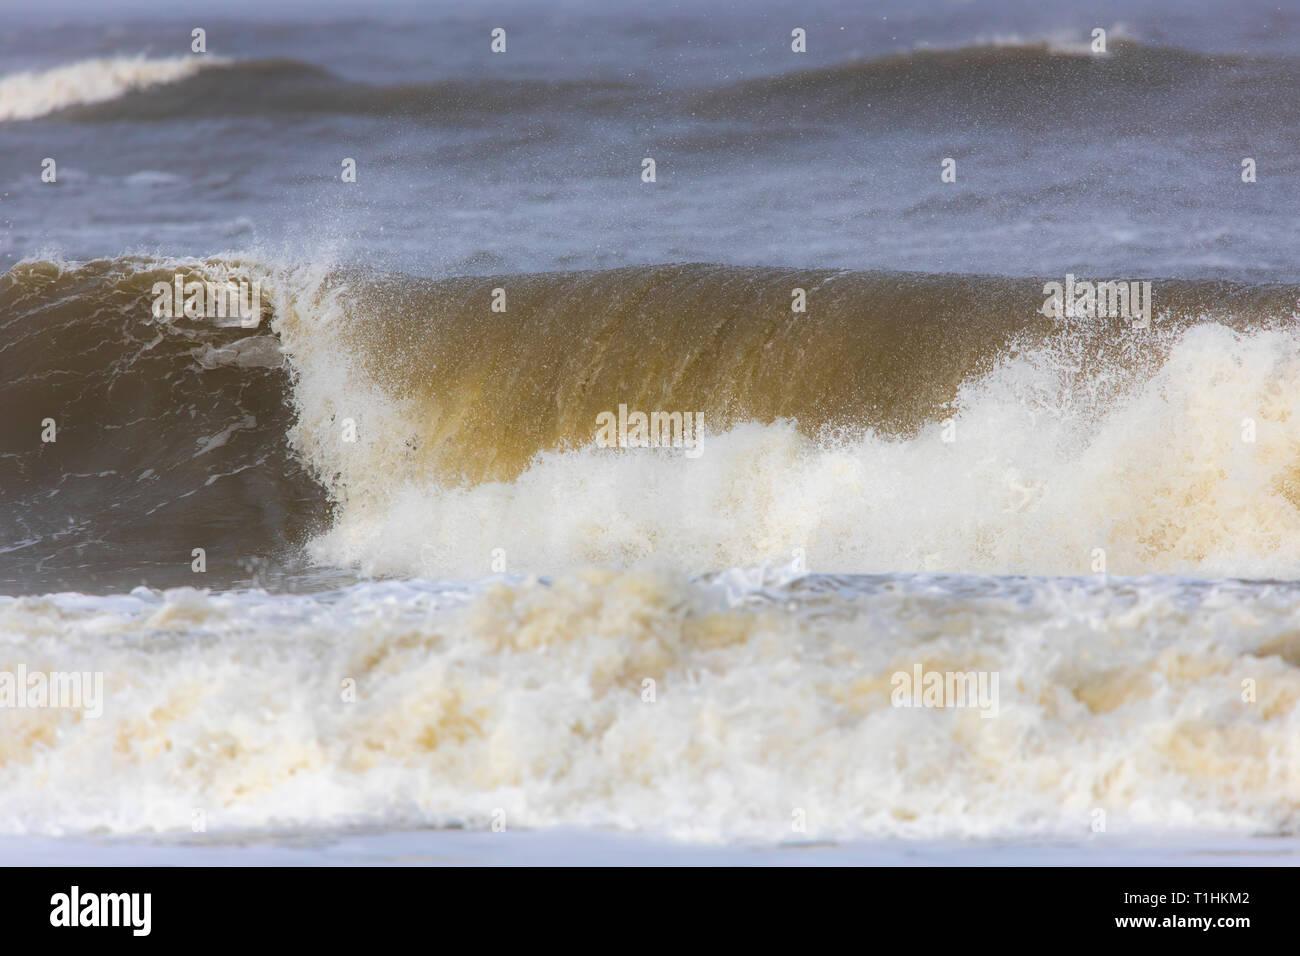 North Sea, waves, surf, tide, storm, North Sea island Langeoog, East Frisia, Lower Saxony, Stock Photo